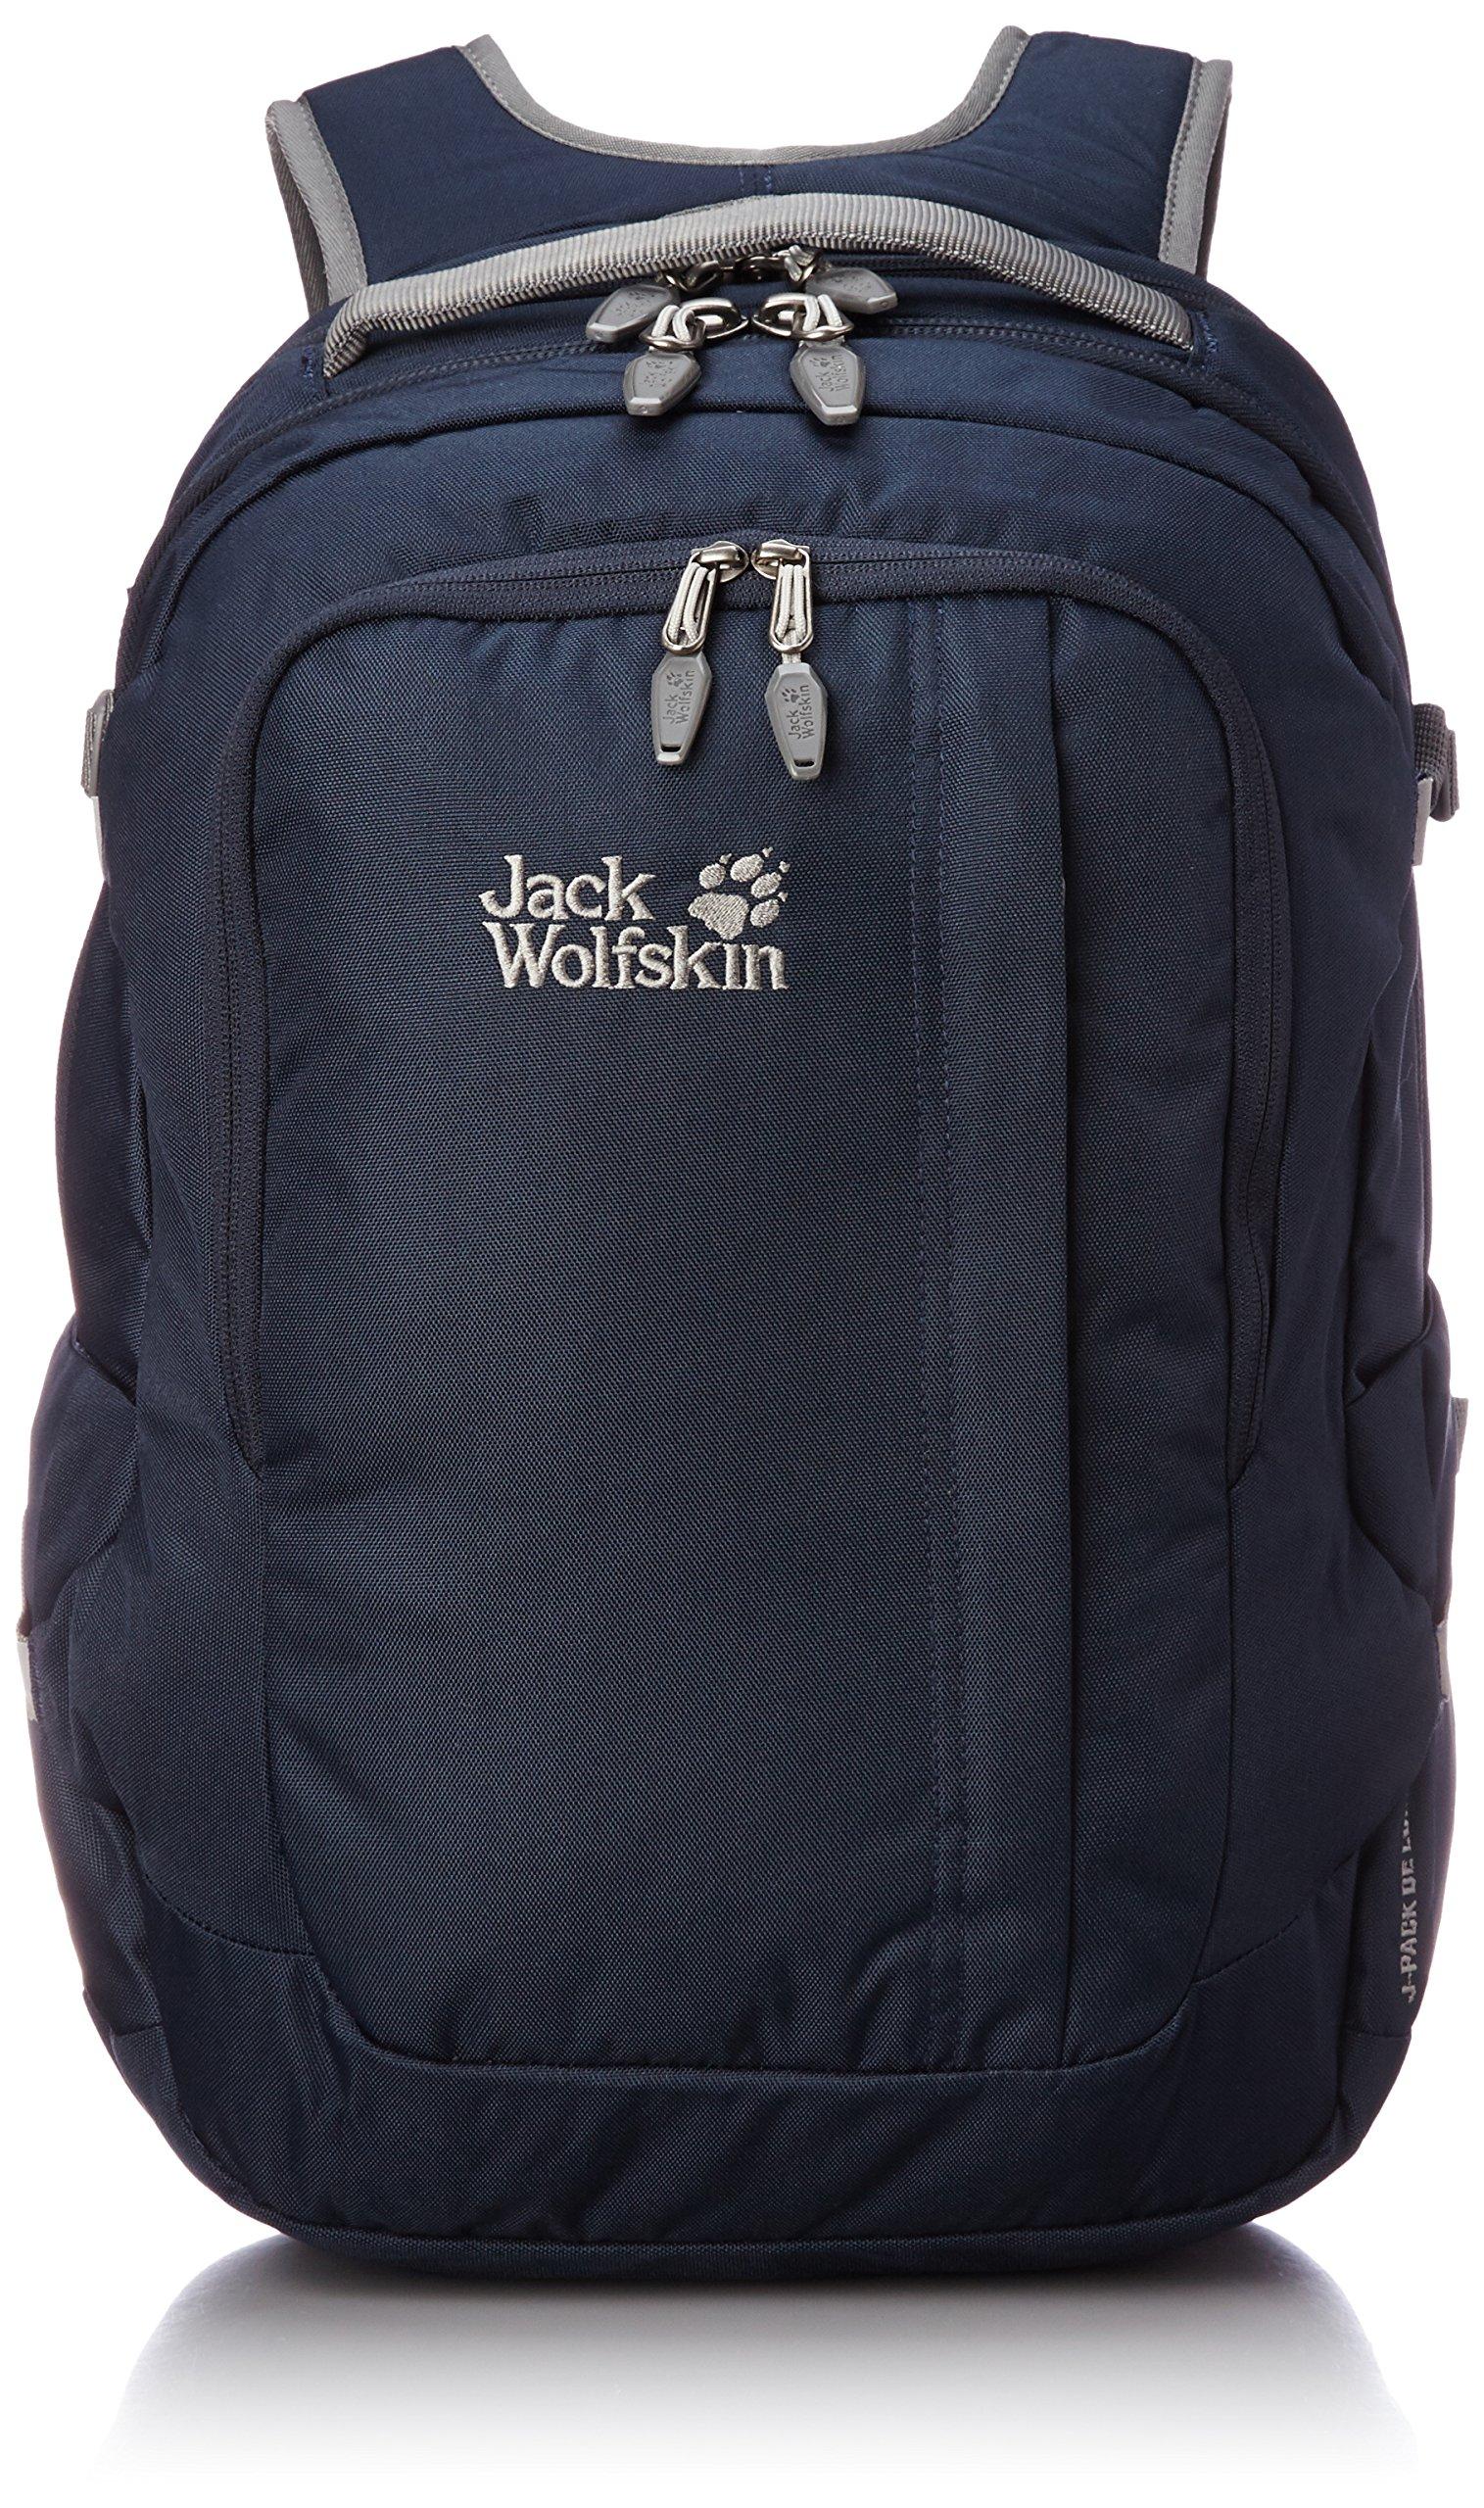 Jack Wolfskin J-Pack De Luxe Business-Travel Pack, Night Blue